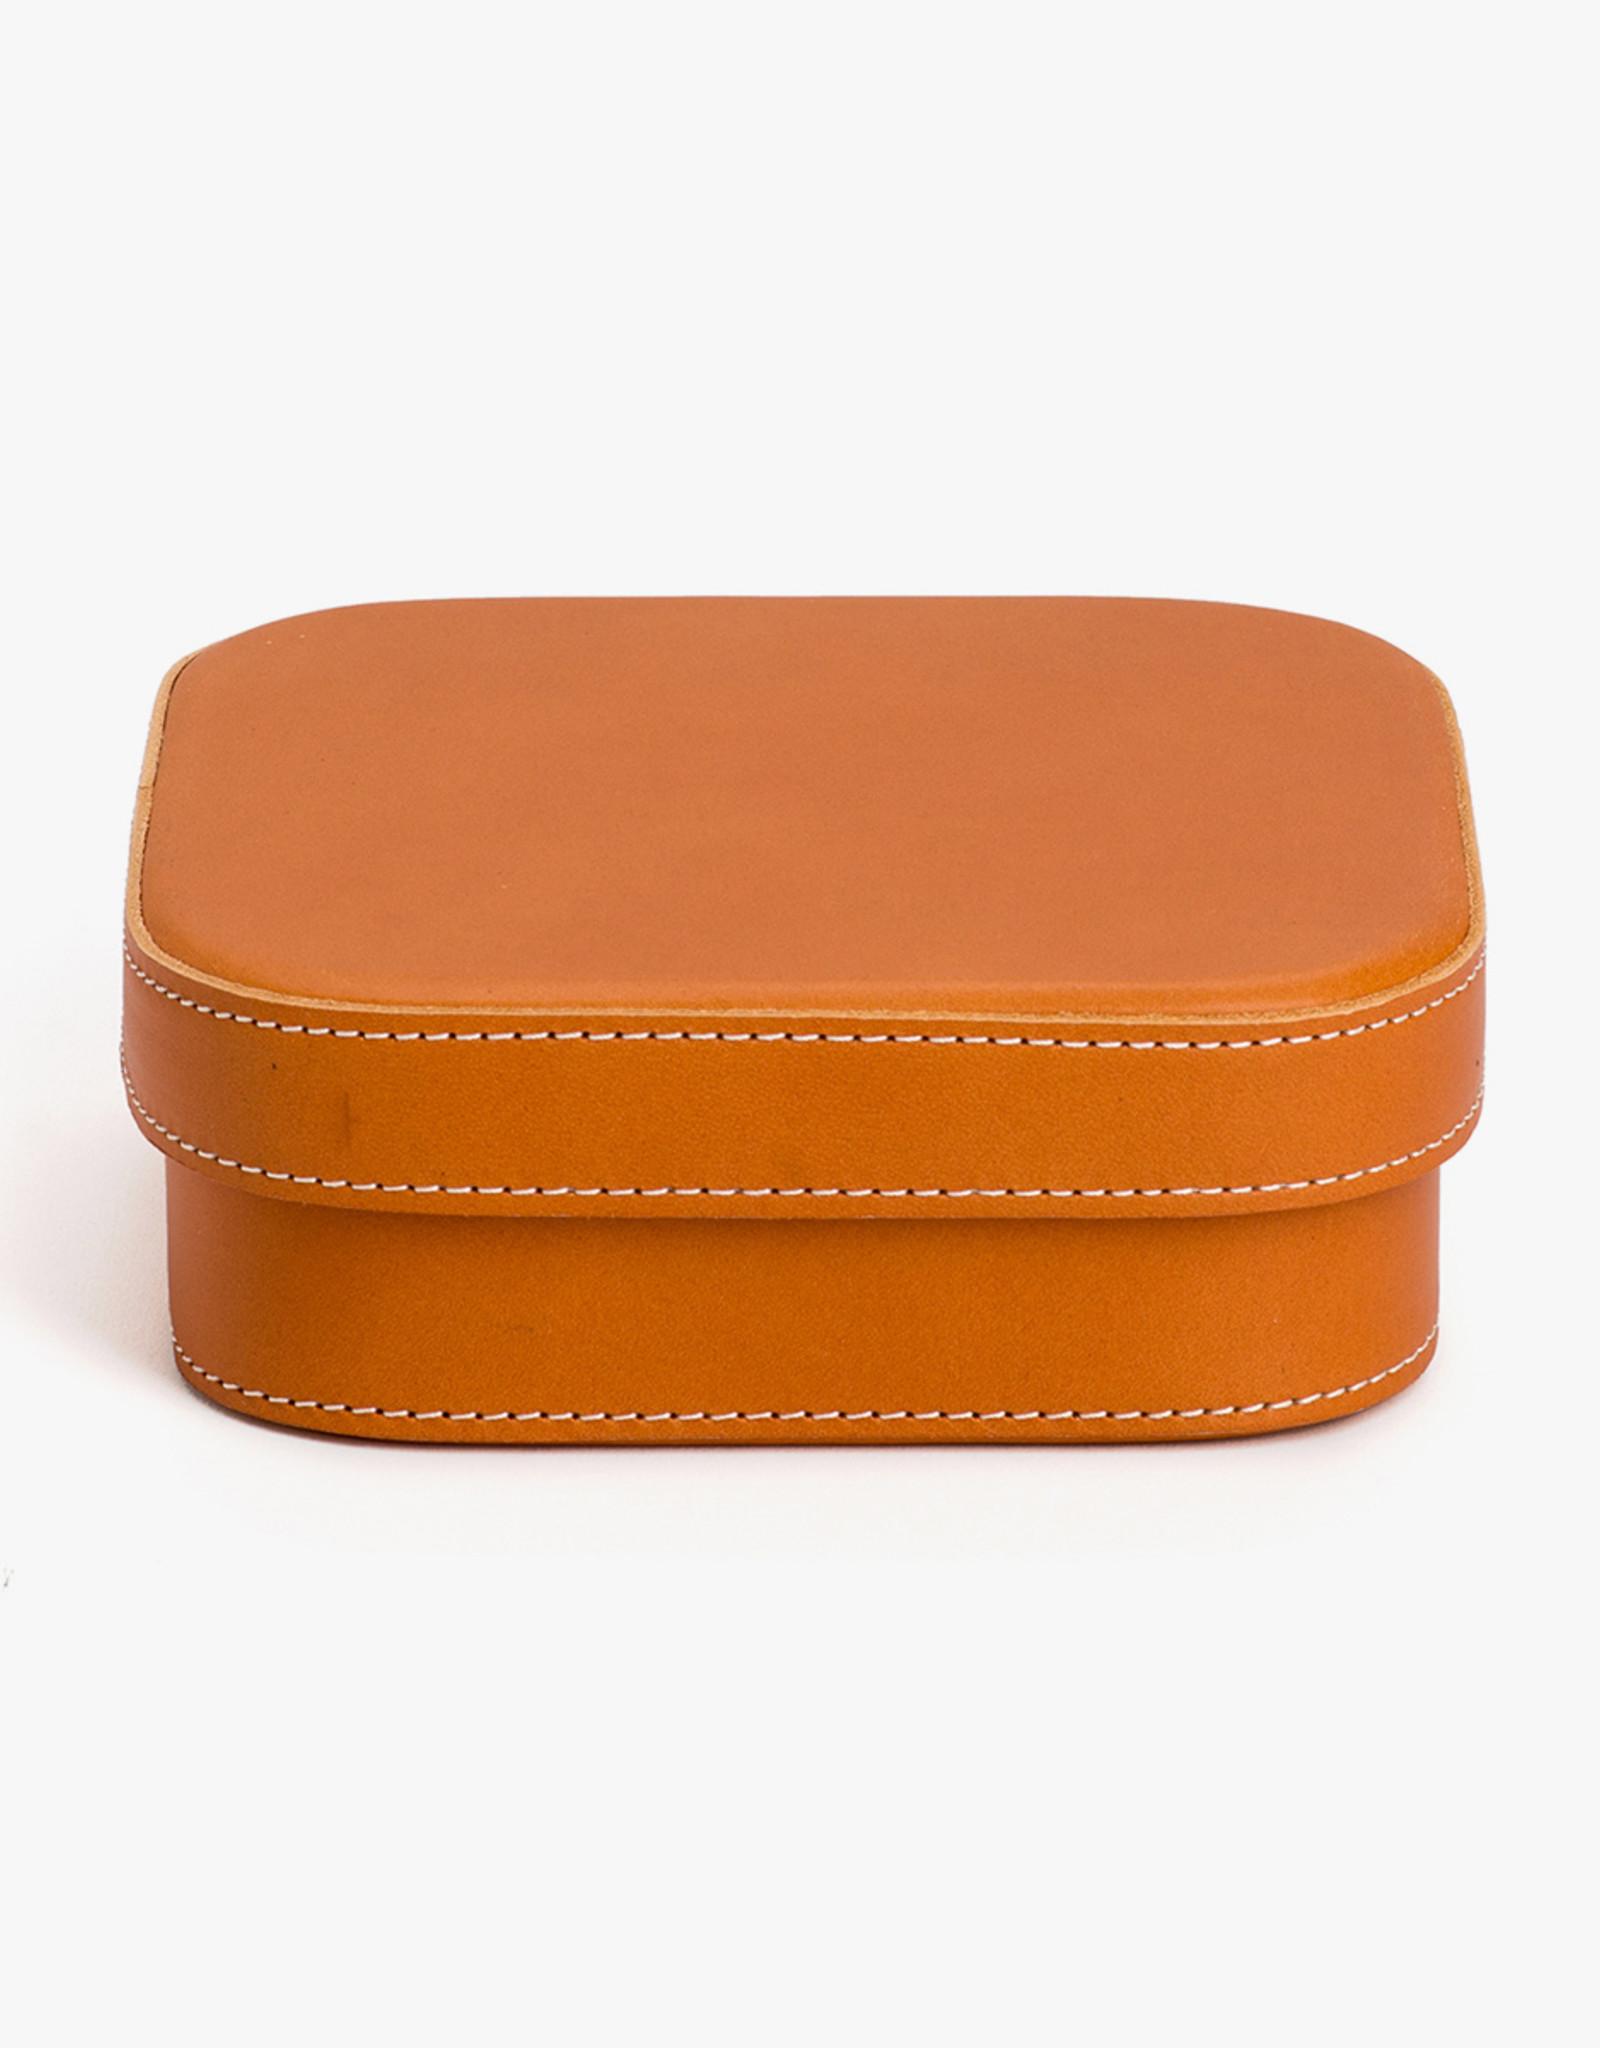 Medium Leather Box by Palmgrens | Tan leather